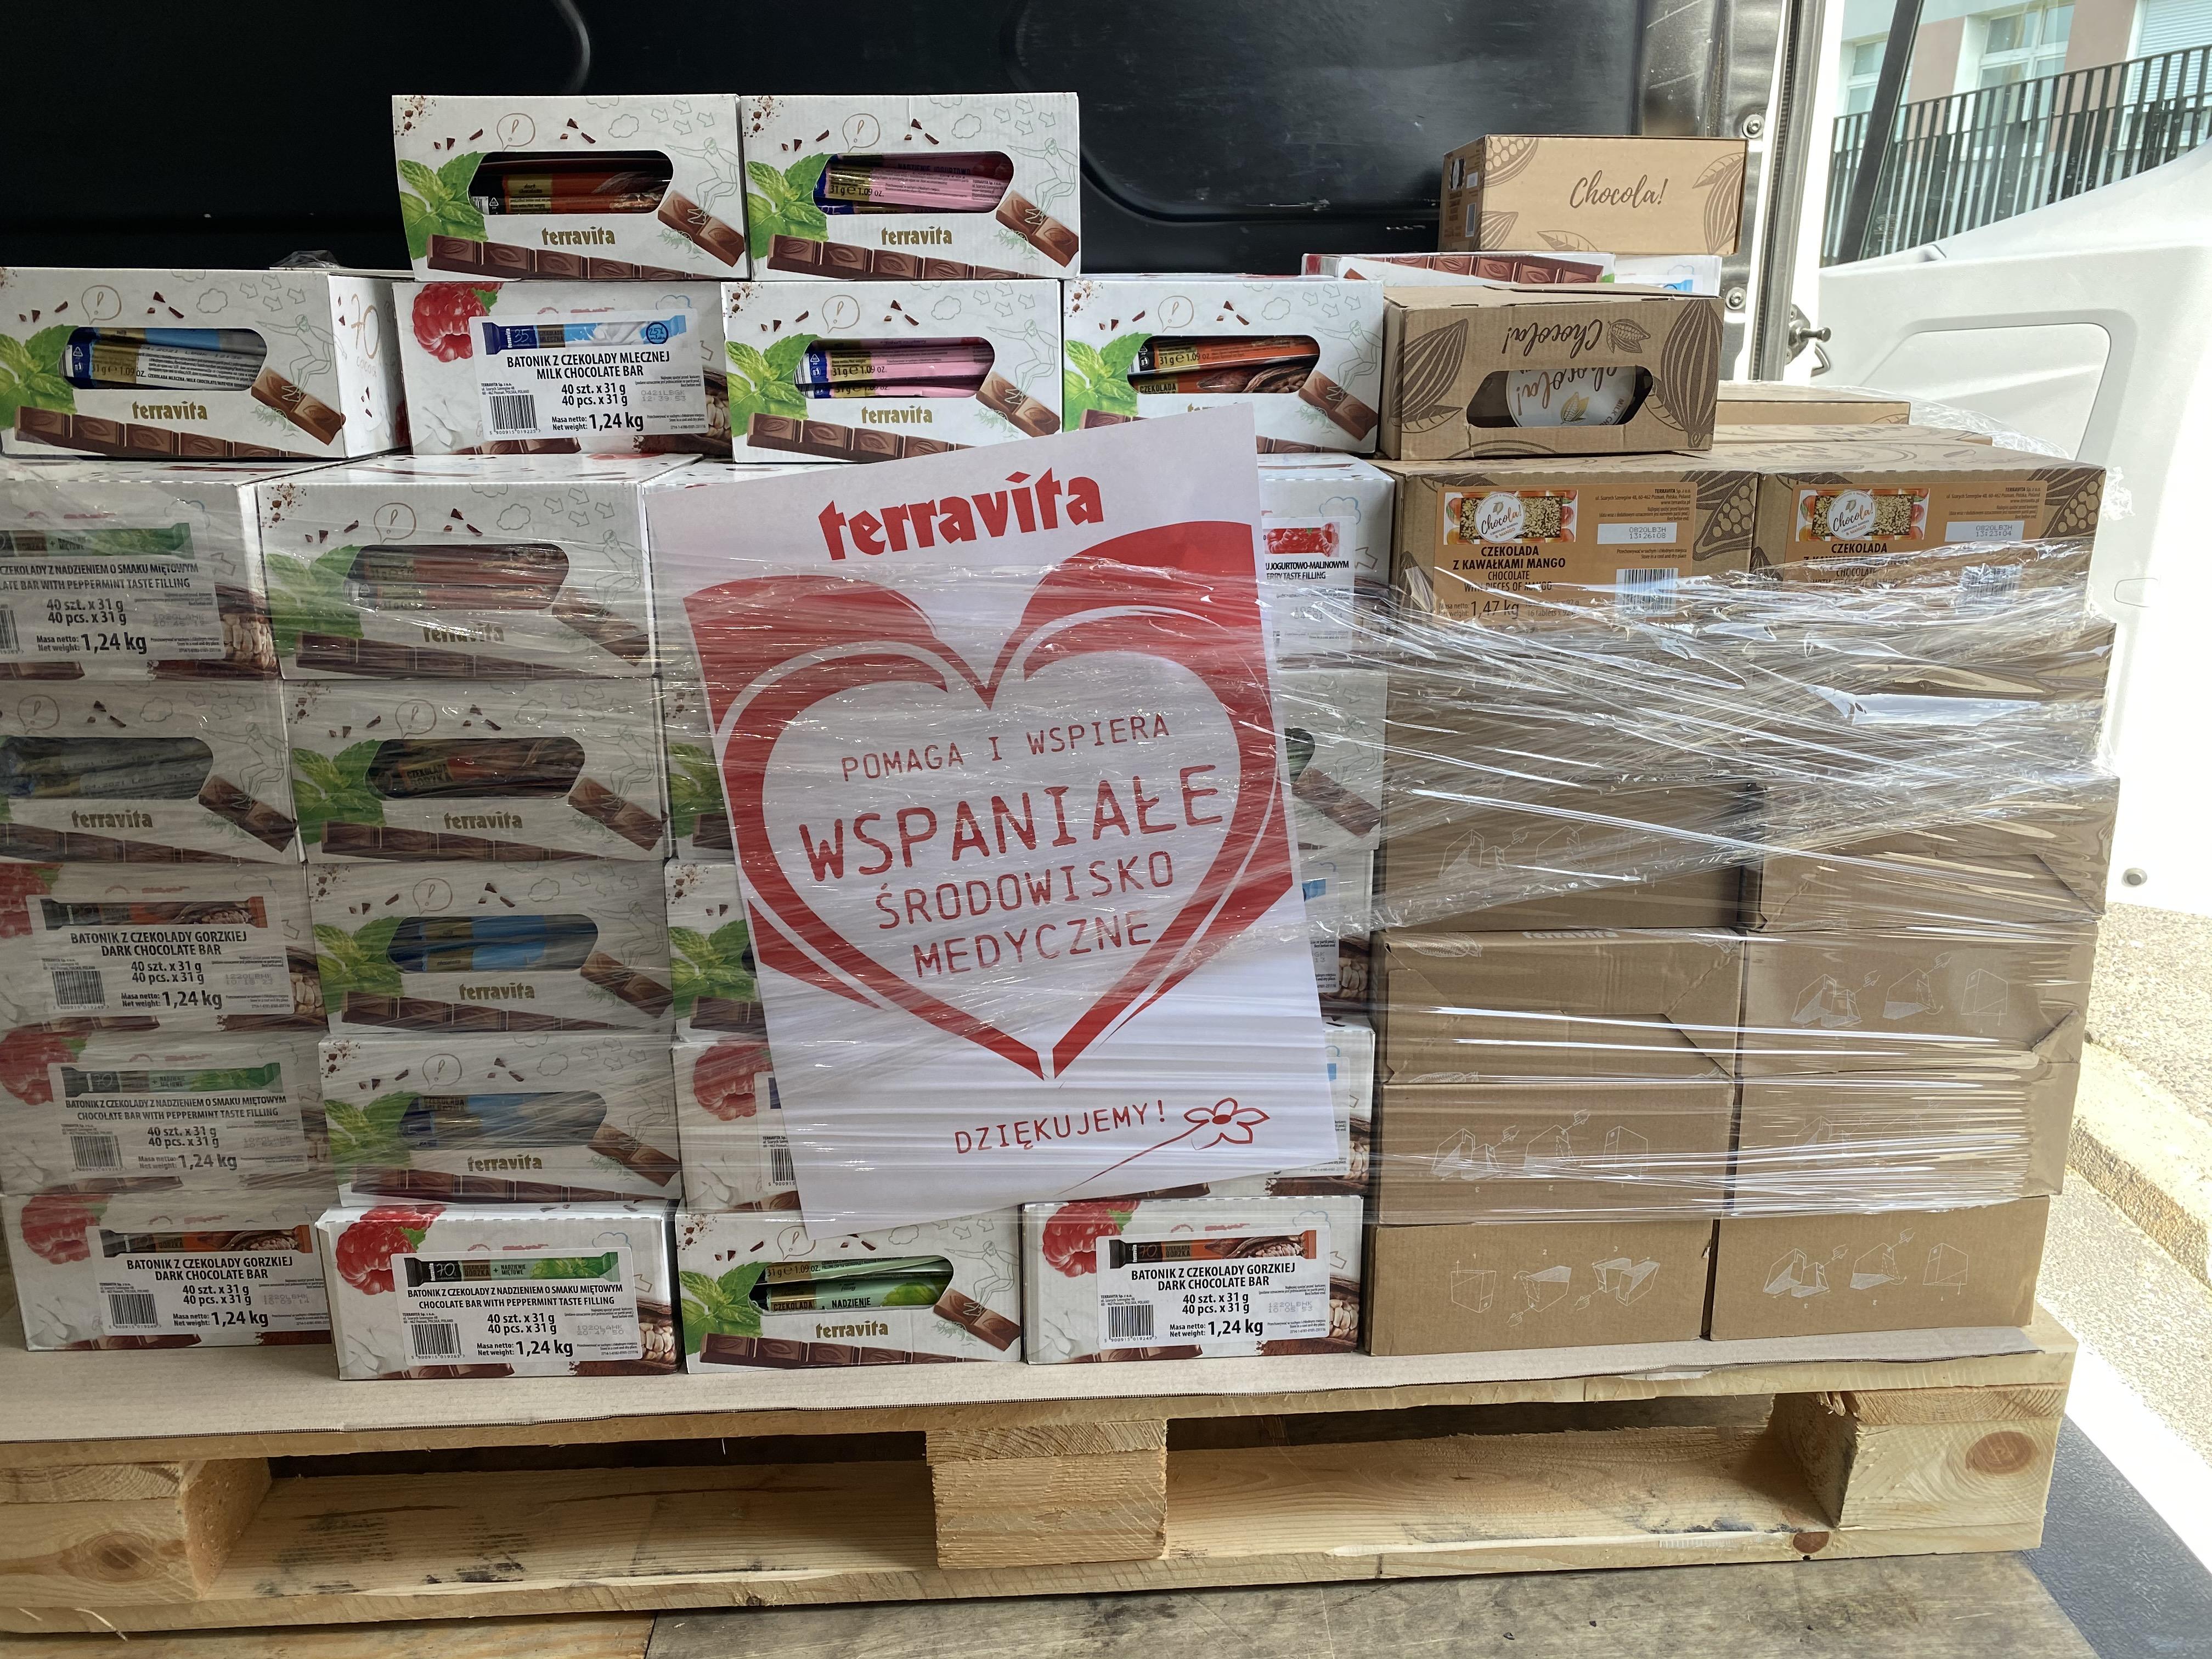 Terravita pomaga poznańskim szpitalom